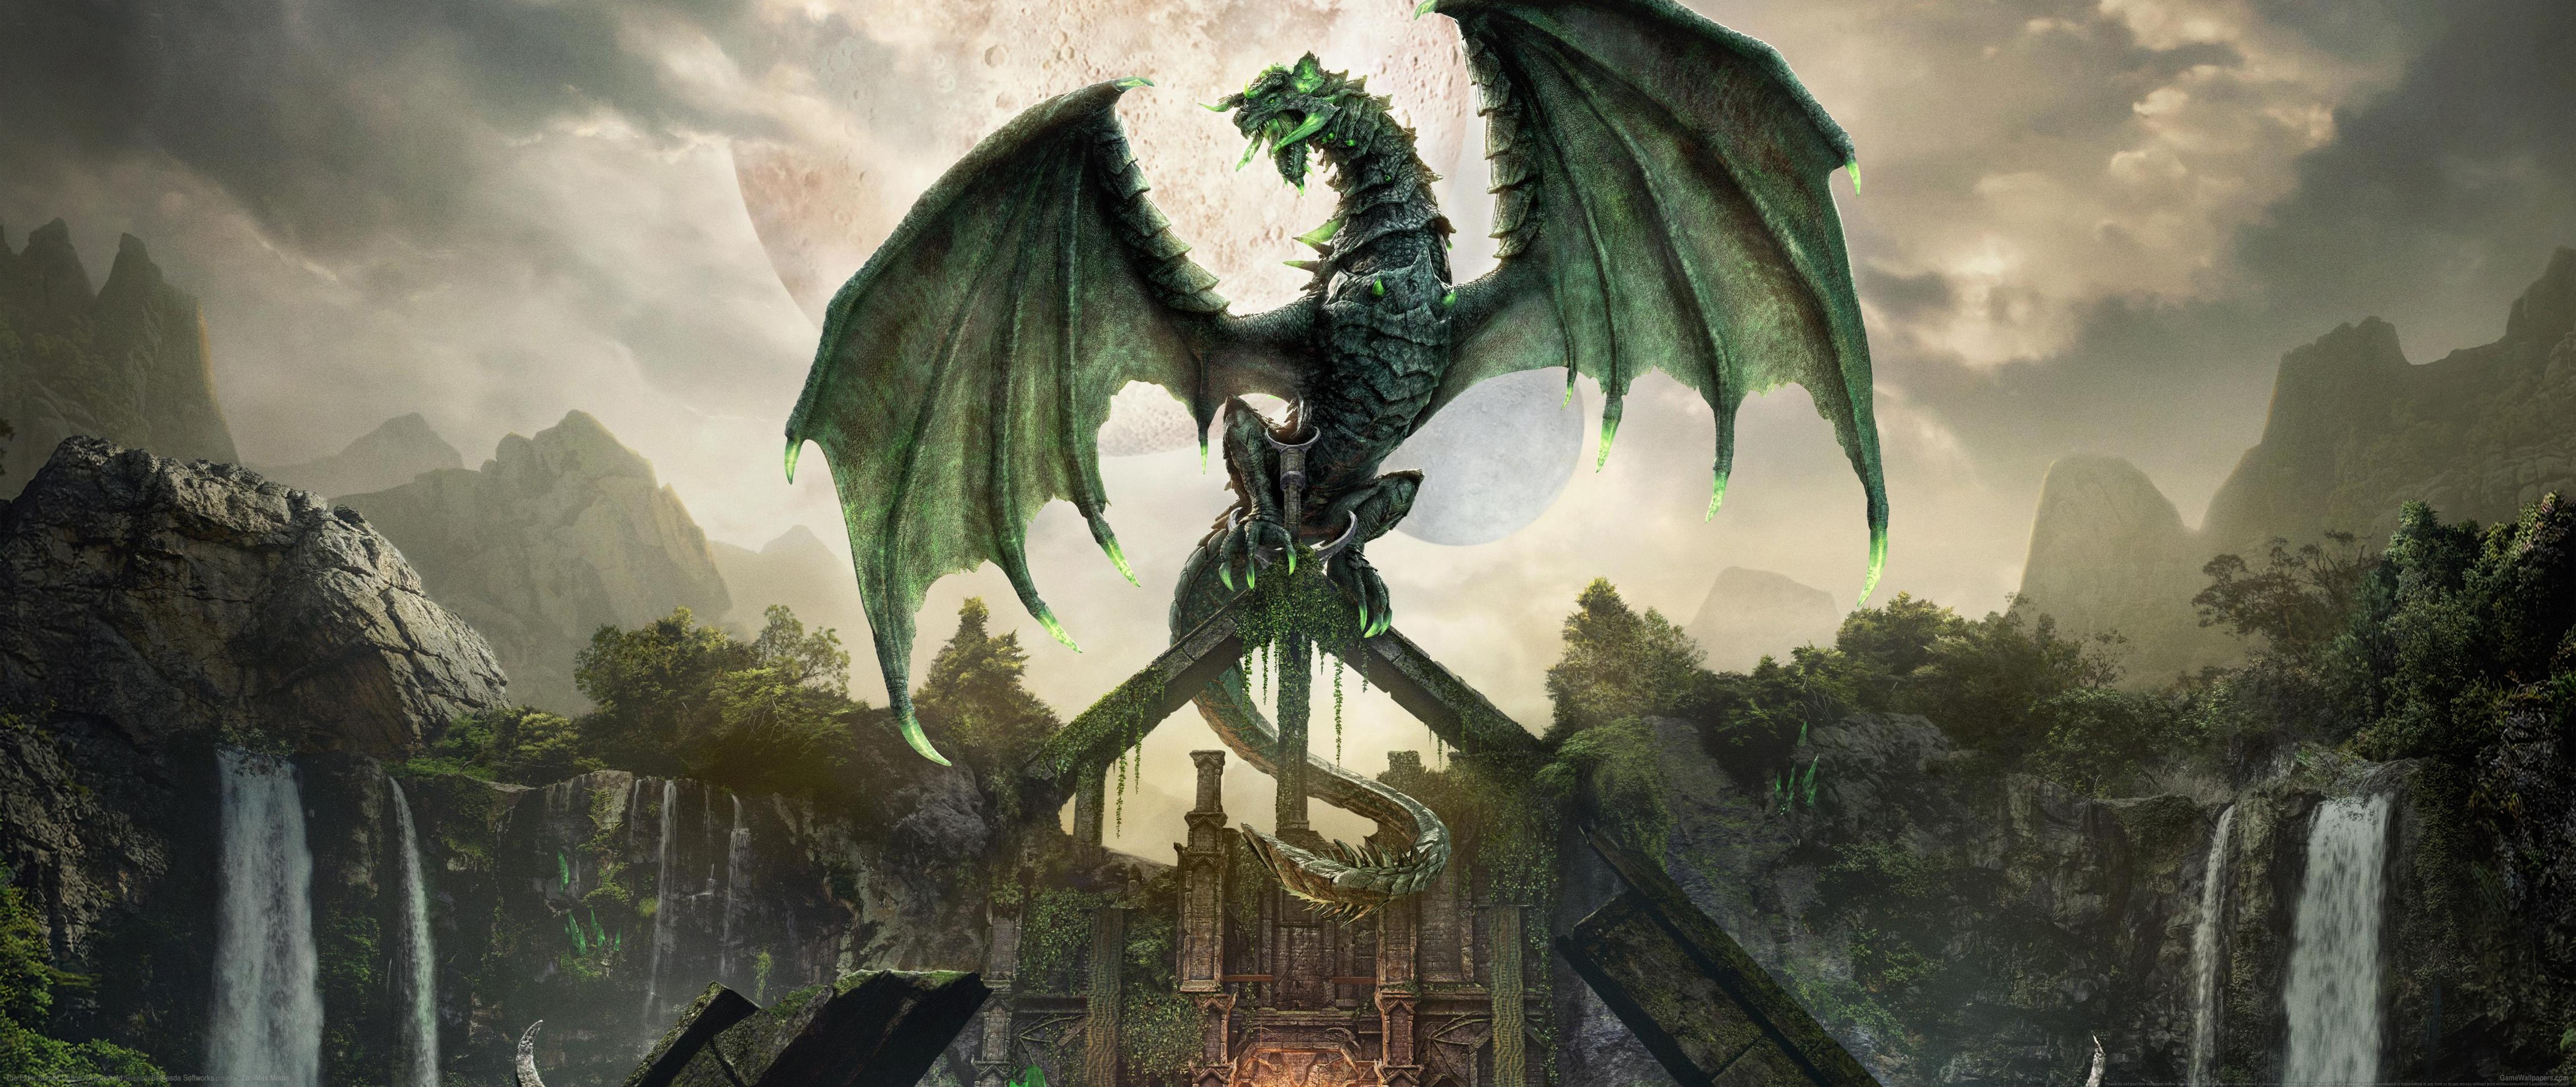 The Elder Scrolls Online: Dragonhold 5120x2160 fondo de escritorio 01